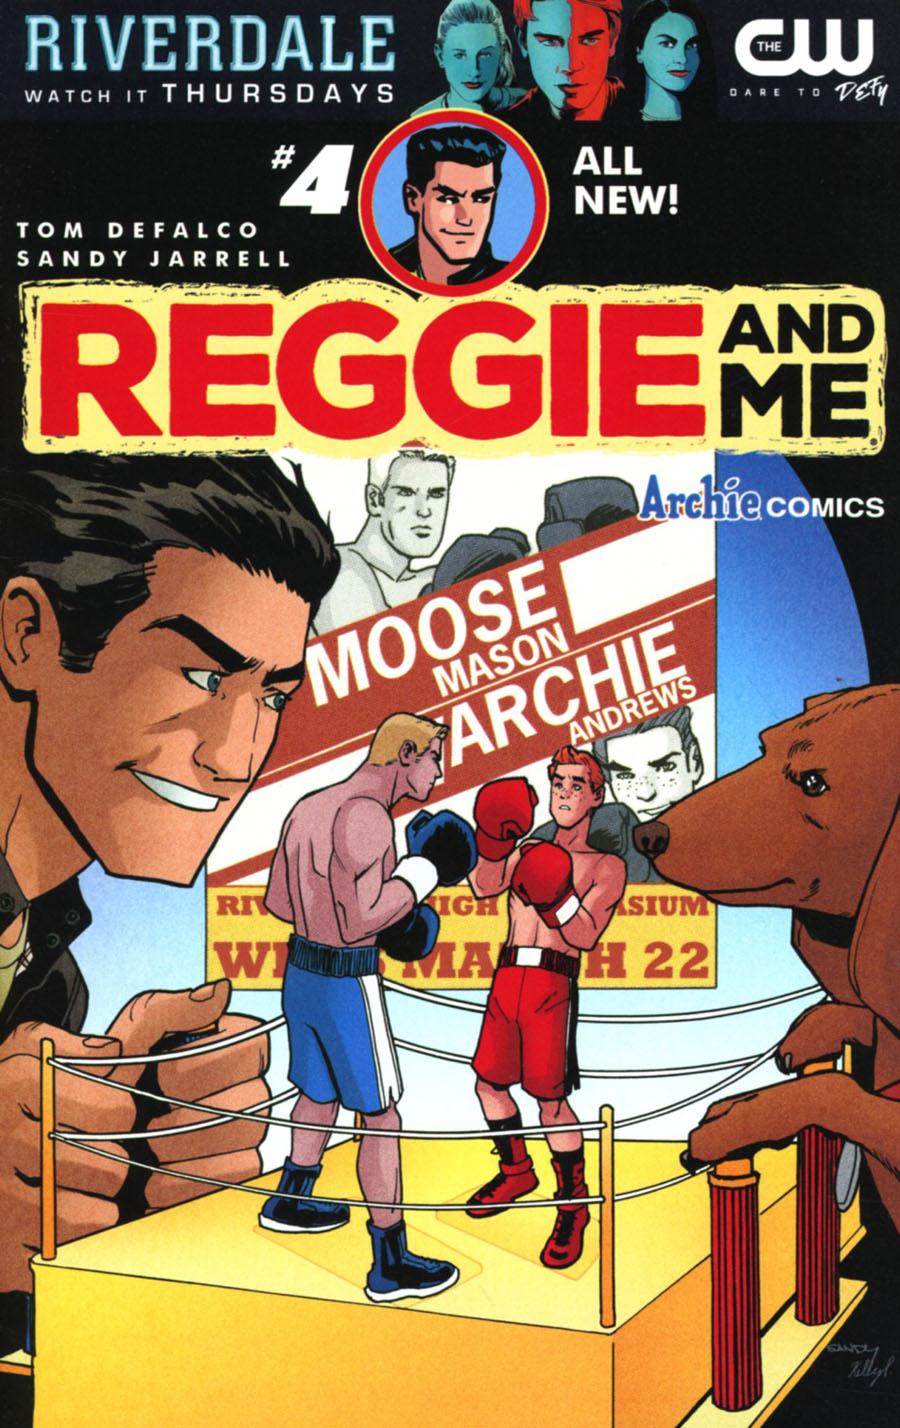 Reggie And Me Vol 2 #4 Cover A Regular Sandy Jarrell Cover